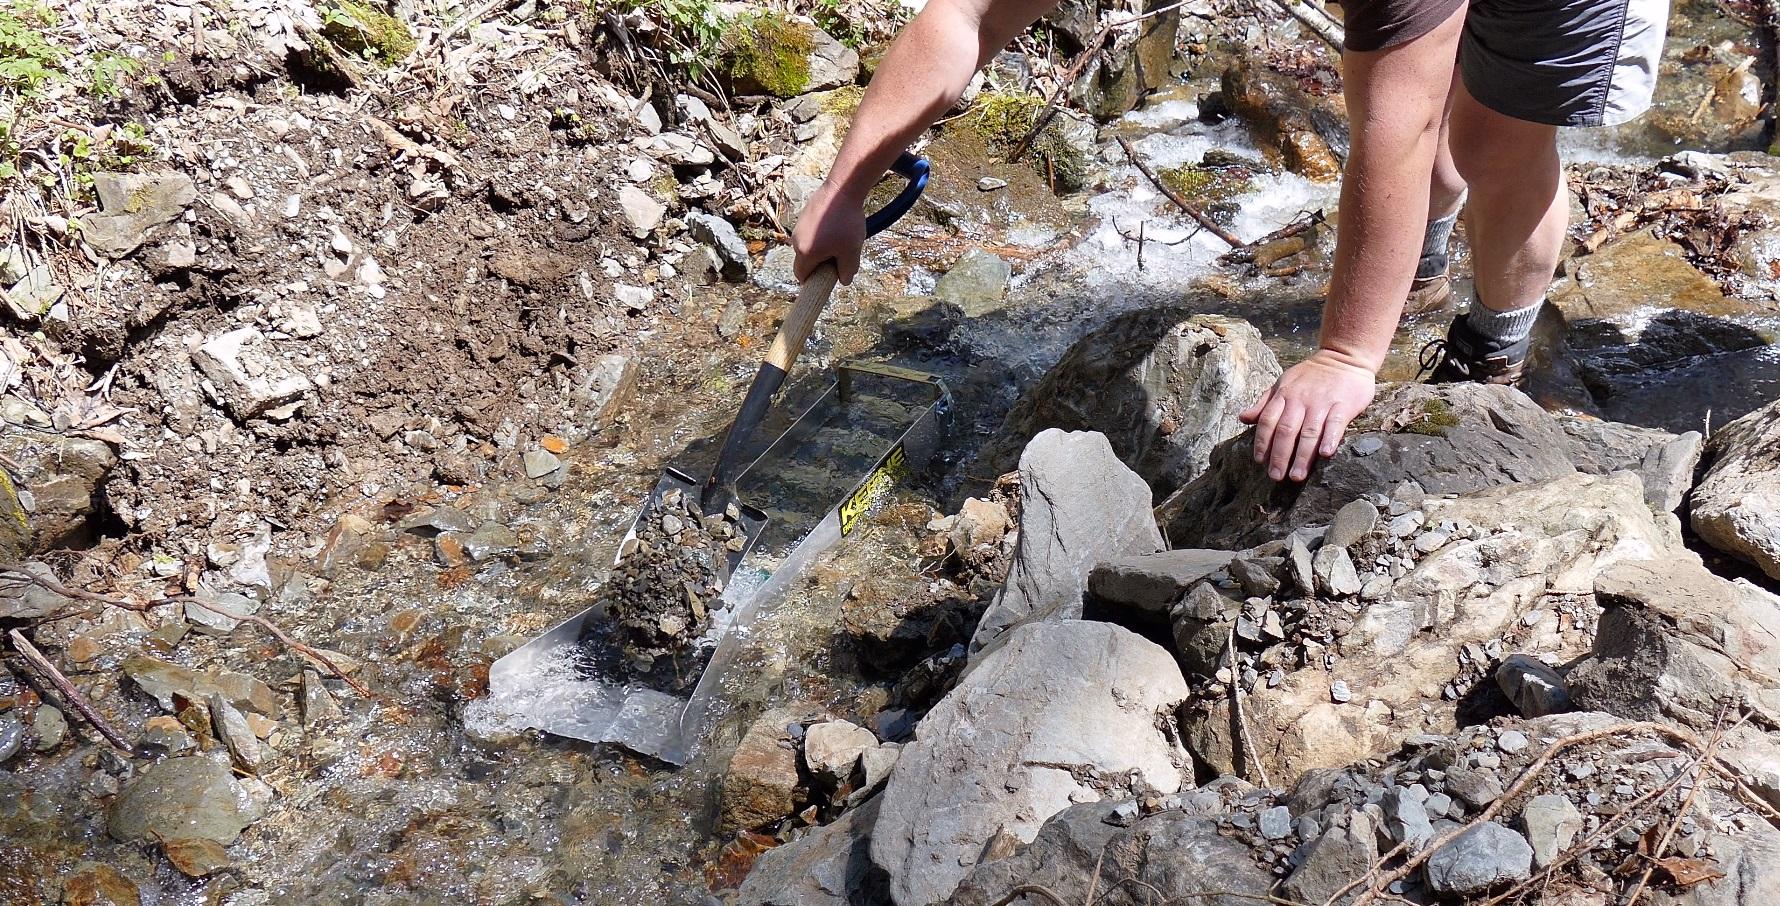 Goldprospektion_Geologie_Limonit (29) - Torsten Marx